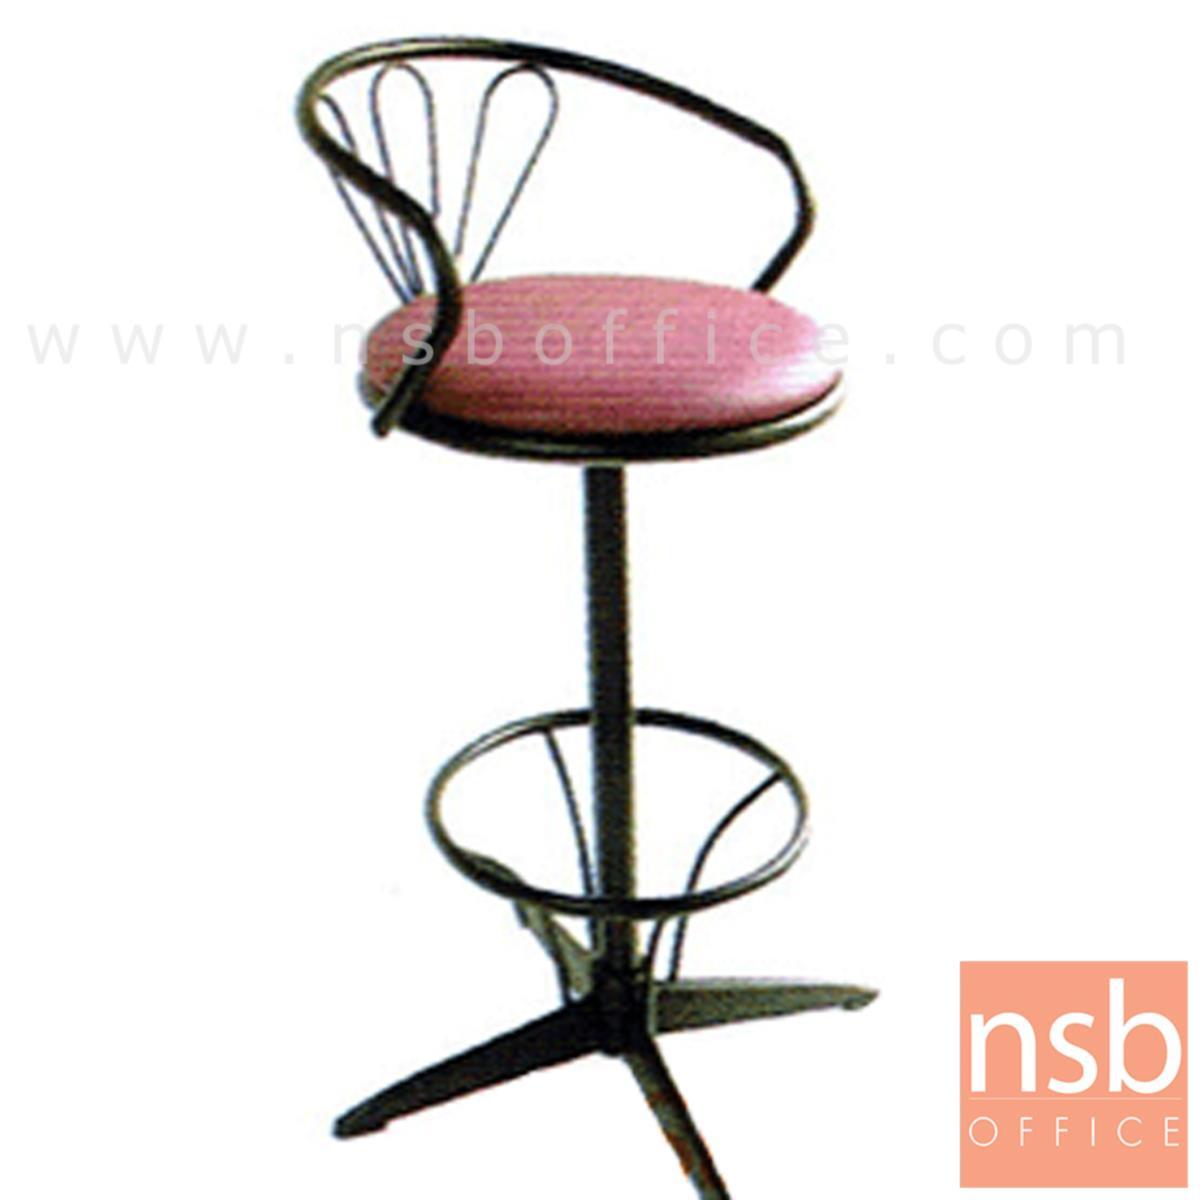 B09A025:เก้าอี้บาร์ที่นั่งกลม รุ่น CS-010 ขาเหล็ก